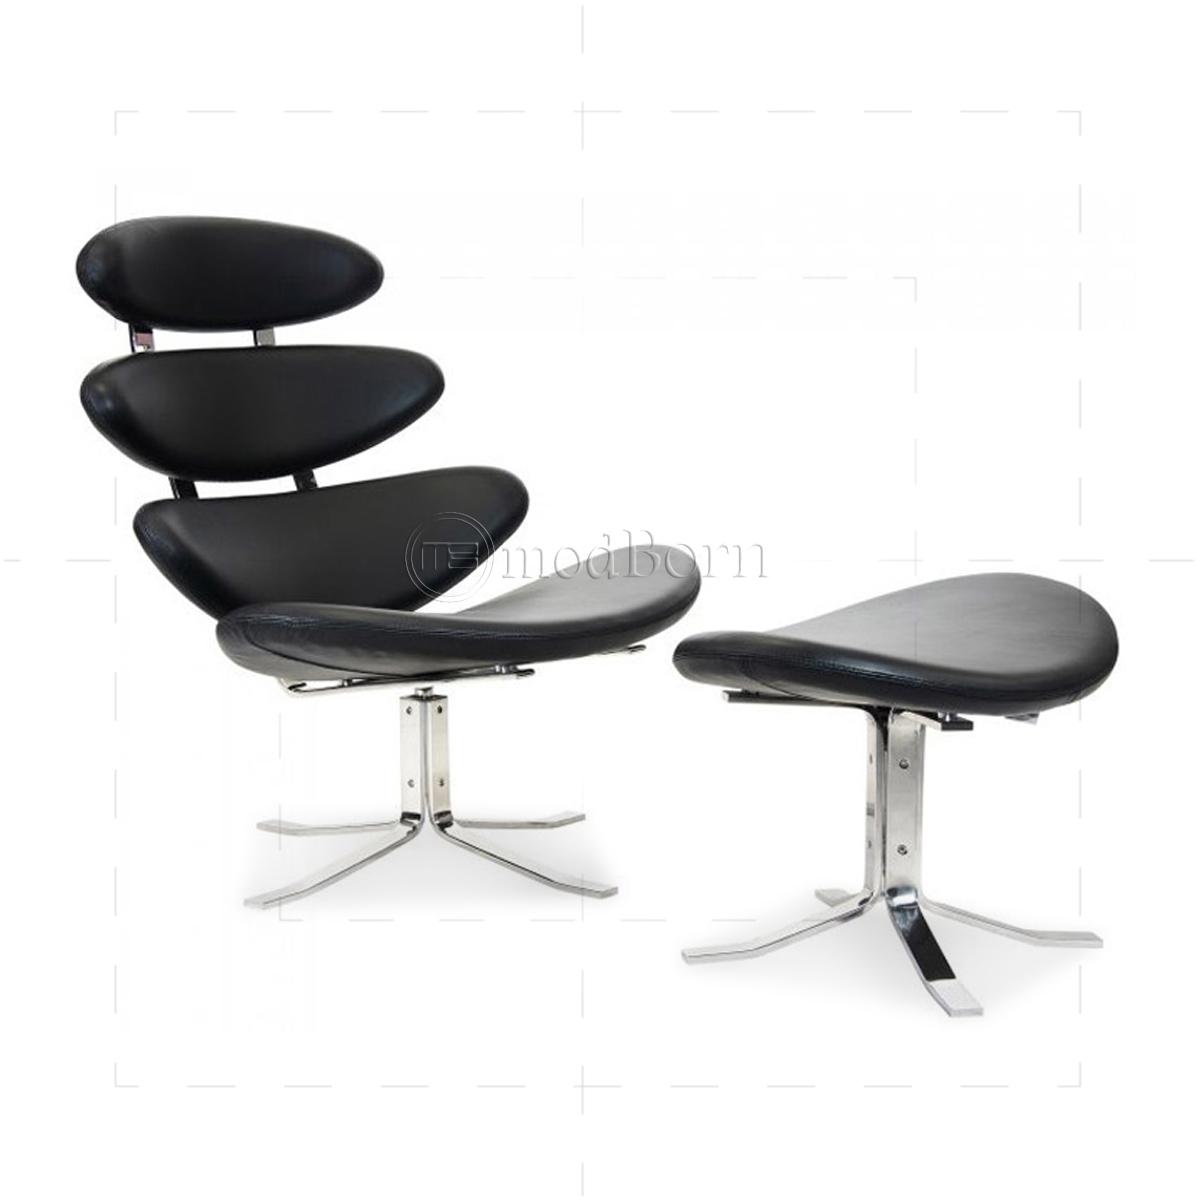 Poul m volther style corona chair and ottoman replica - Corona chair replica ...